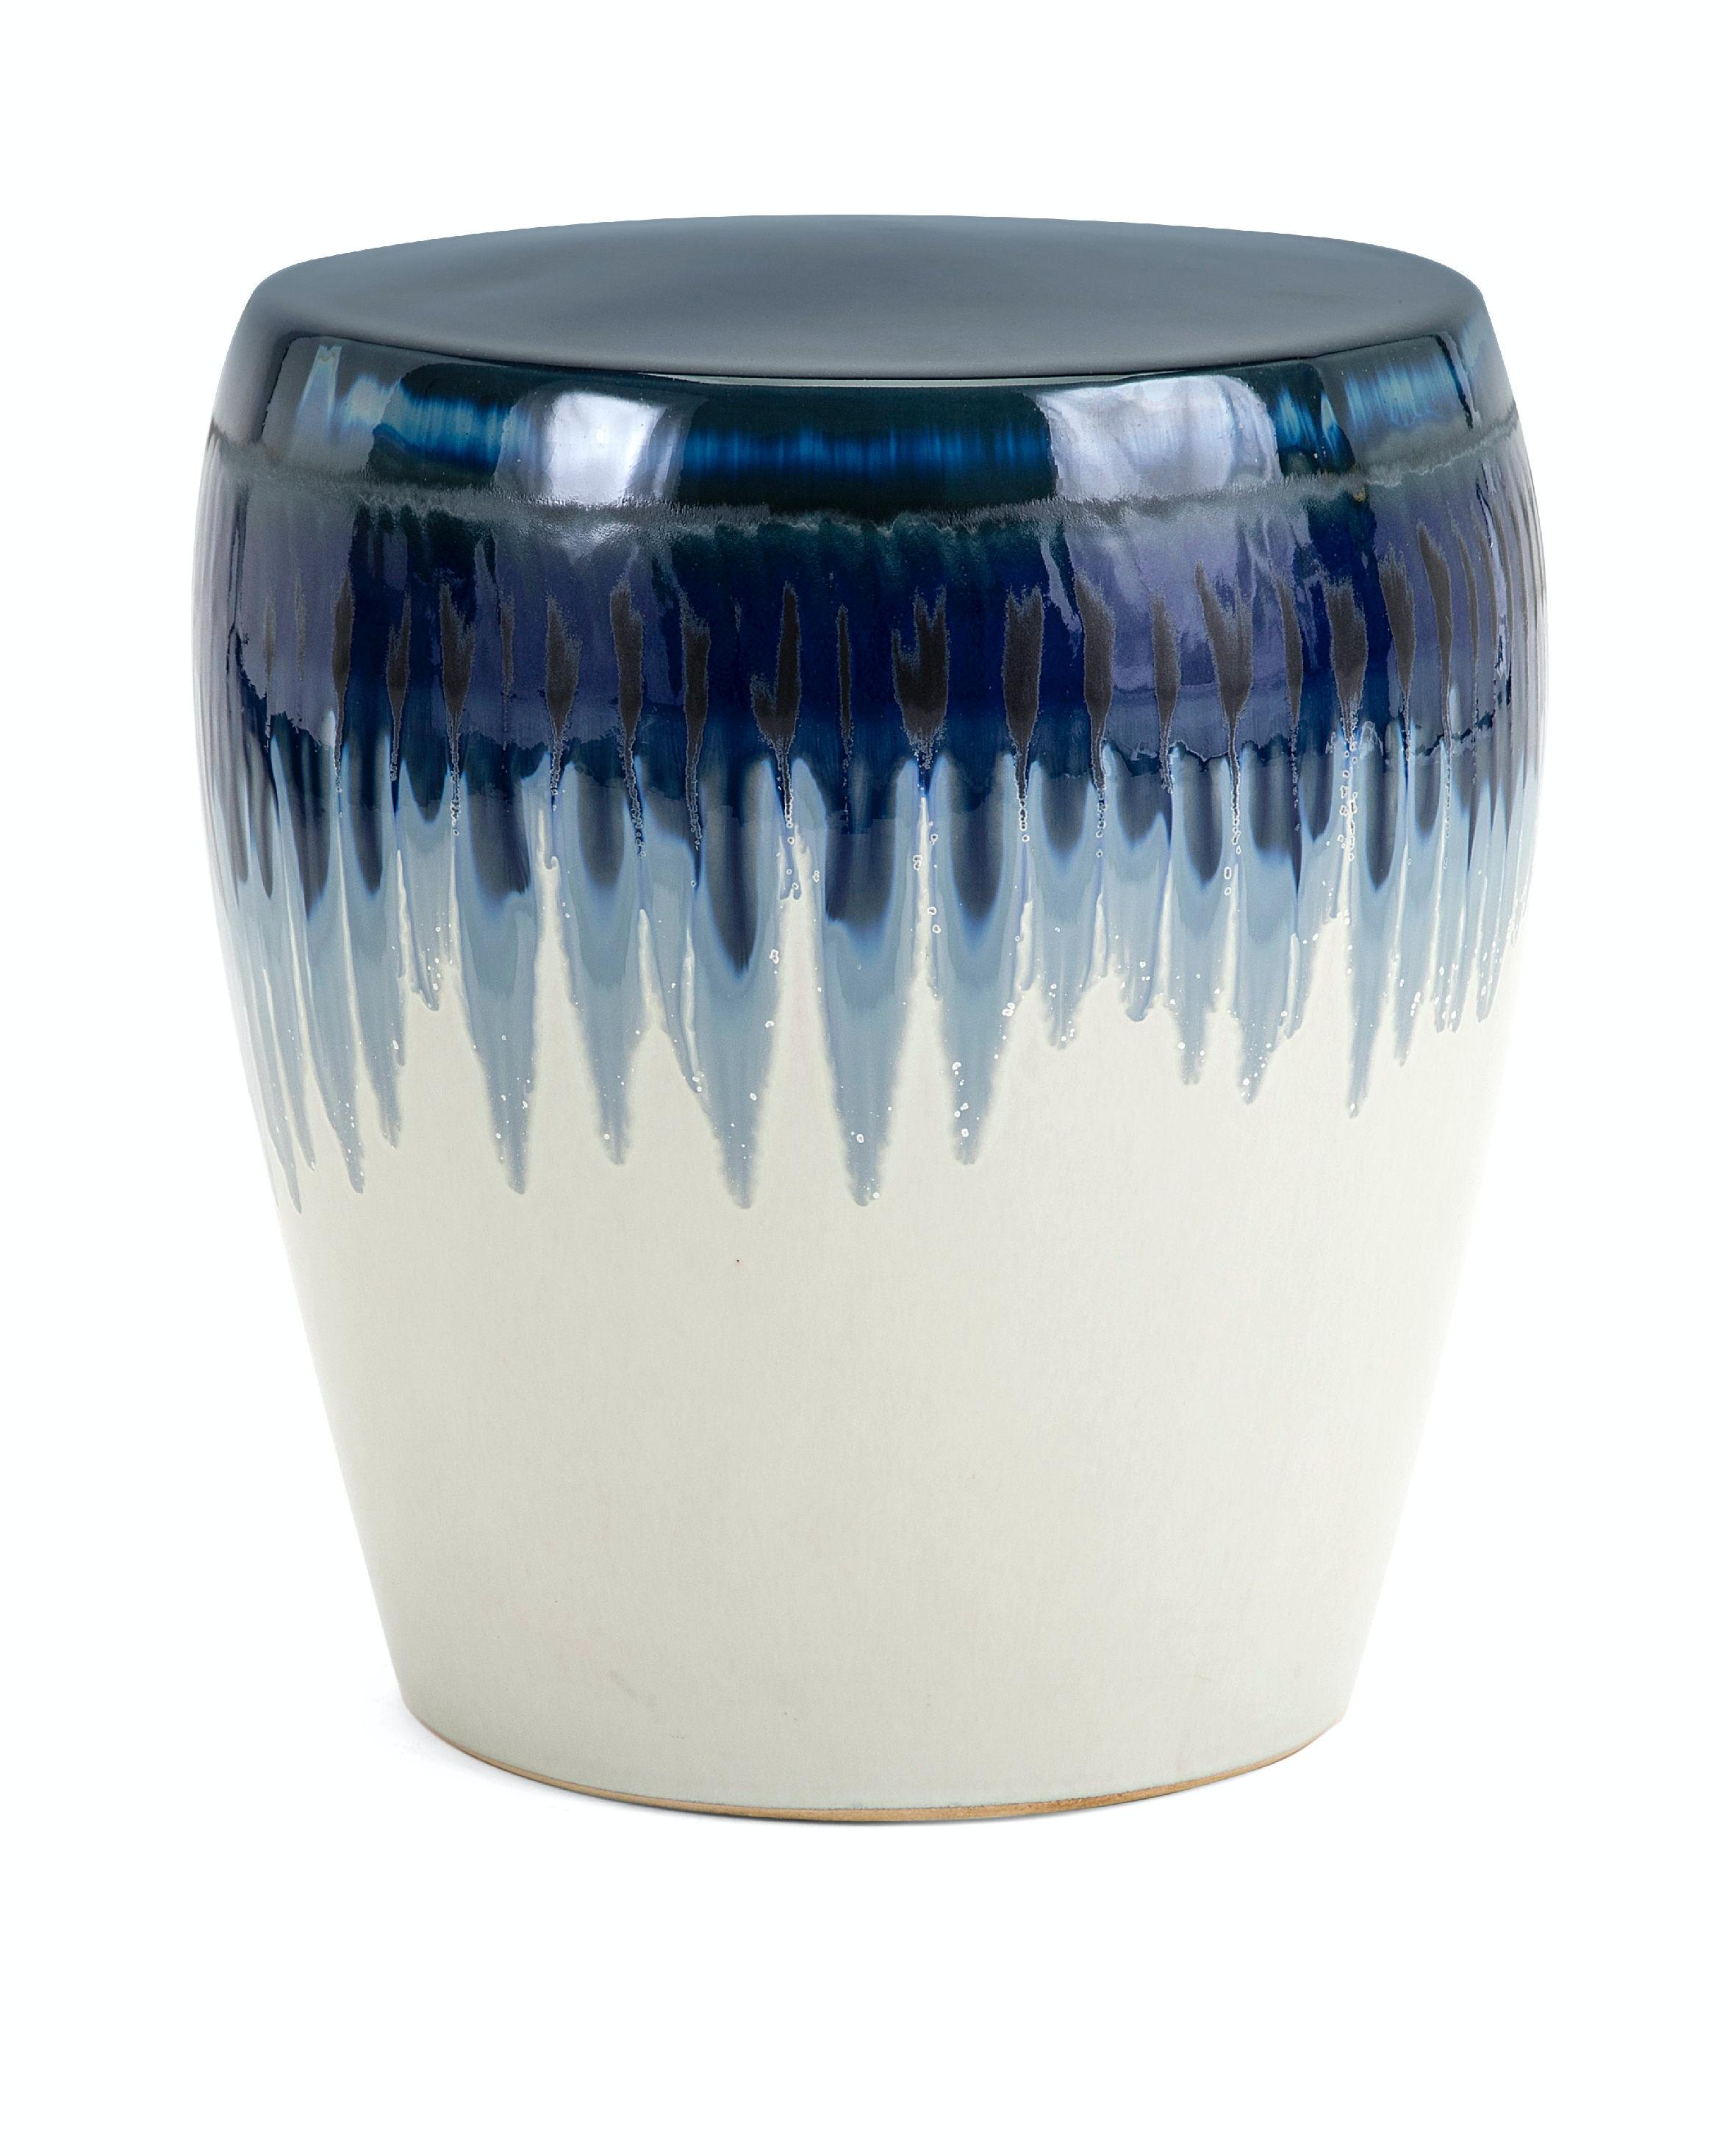 IMAX Corporation Outdoor/Patio Hamako Ceramic Garden Stool 13724 At Carol  House Furniture